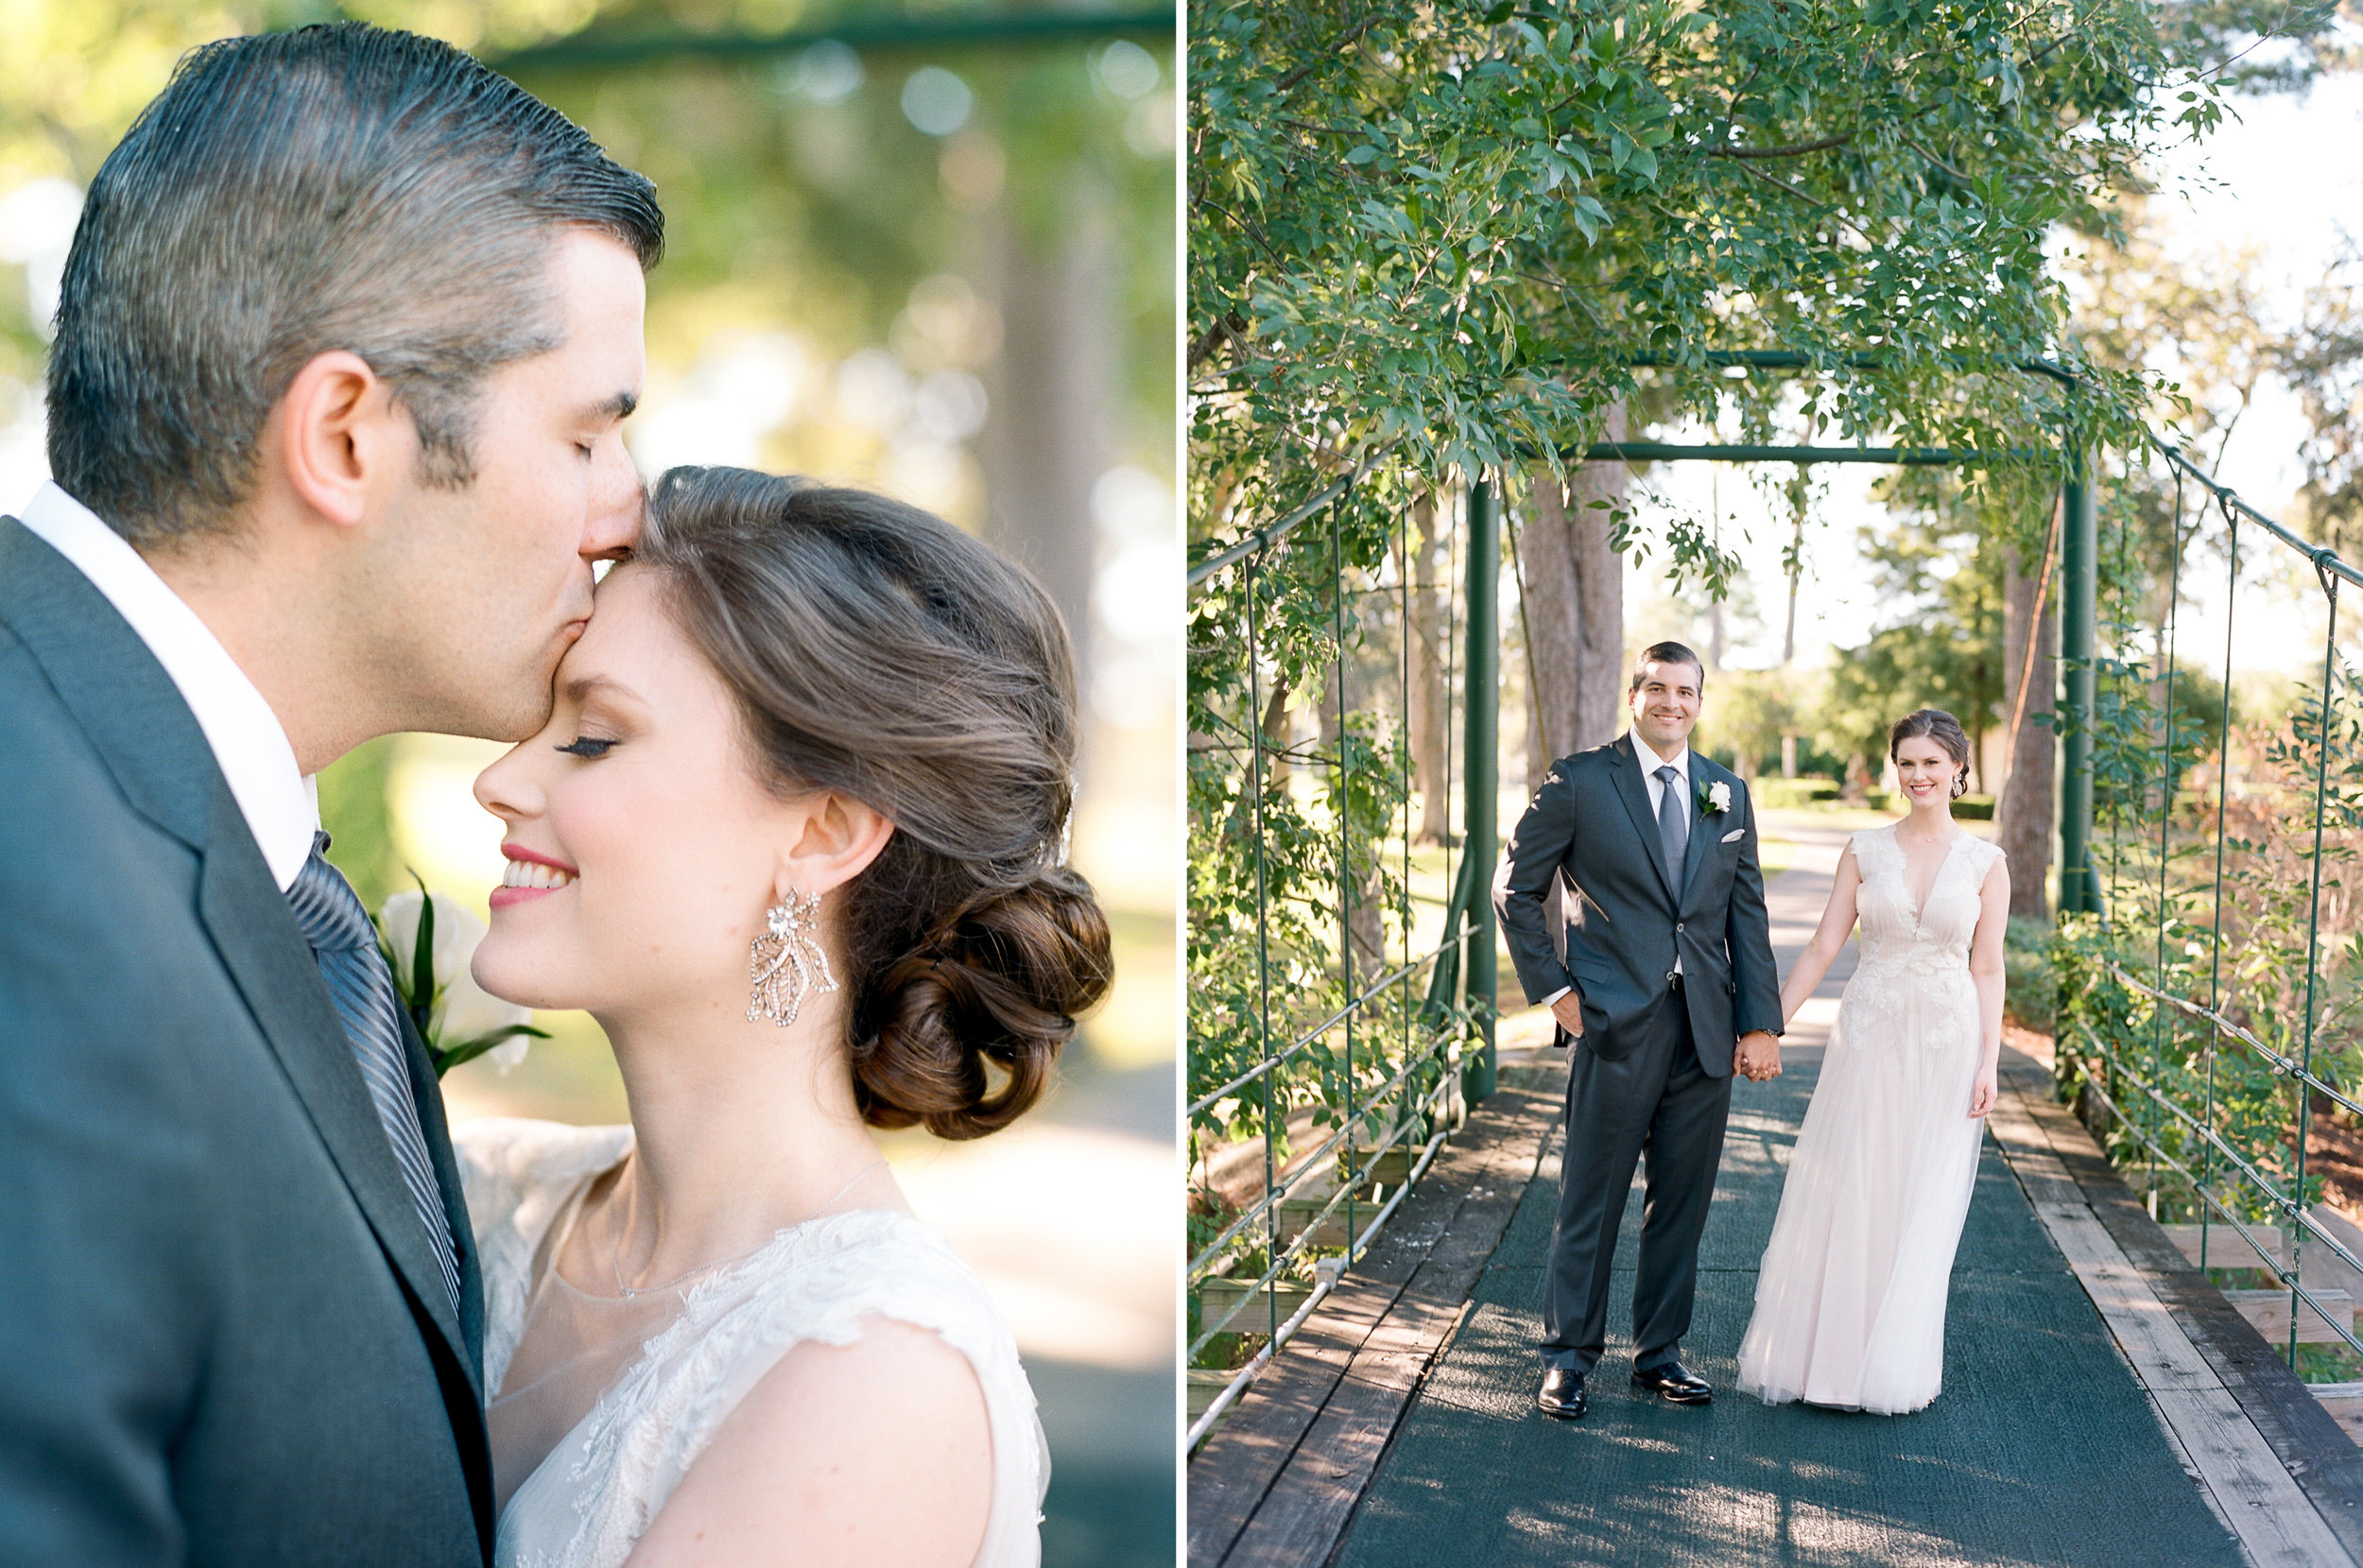 Houston-Wedding-Photographer-Lakeside-Country-Club-First-Look-Bride-Groom-Formals-Film-Fine-Art-Photography-107.jpg